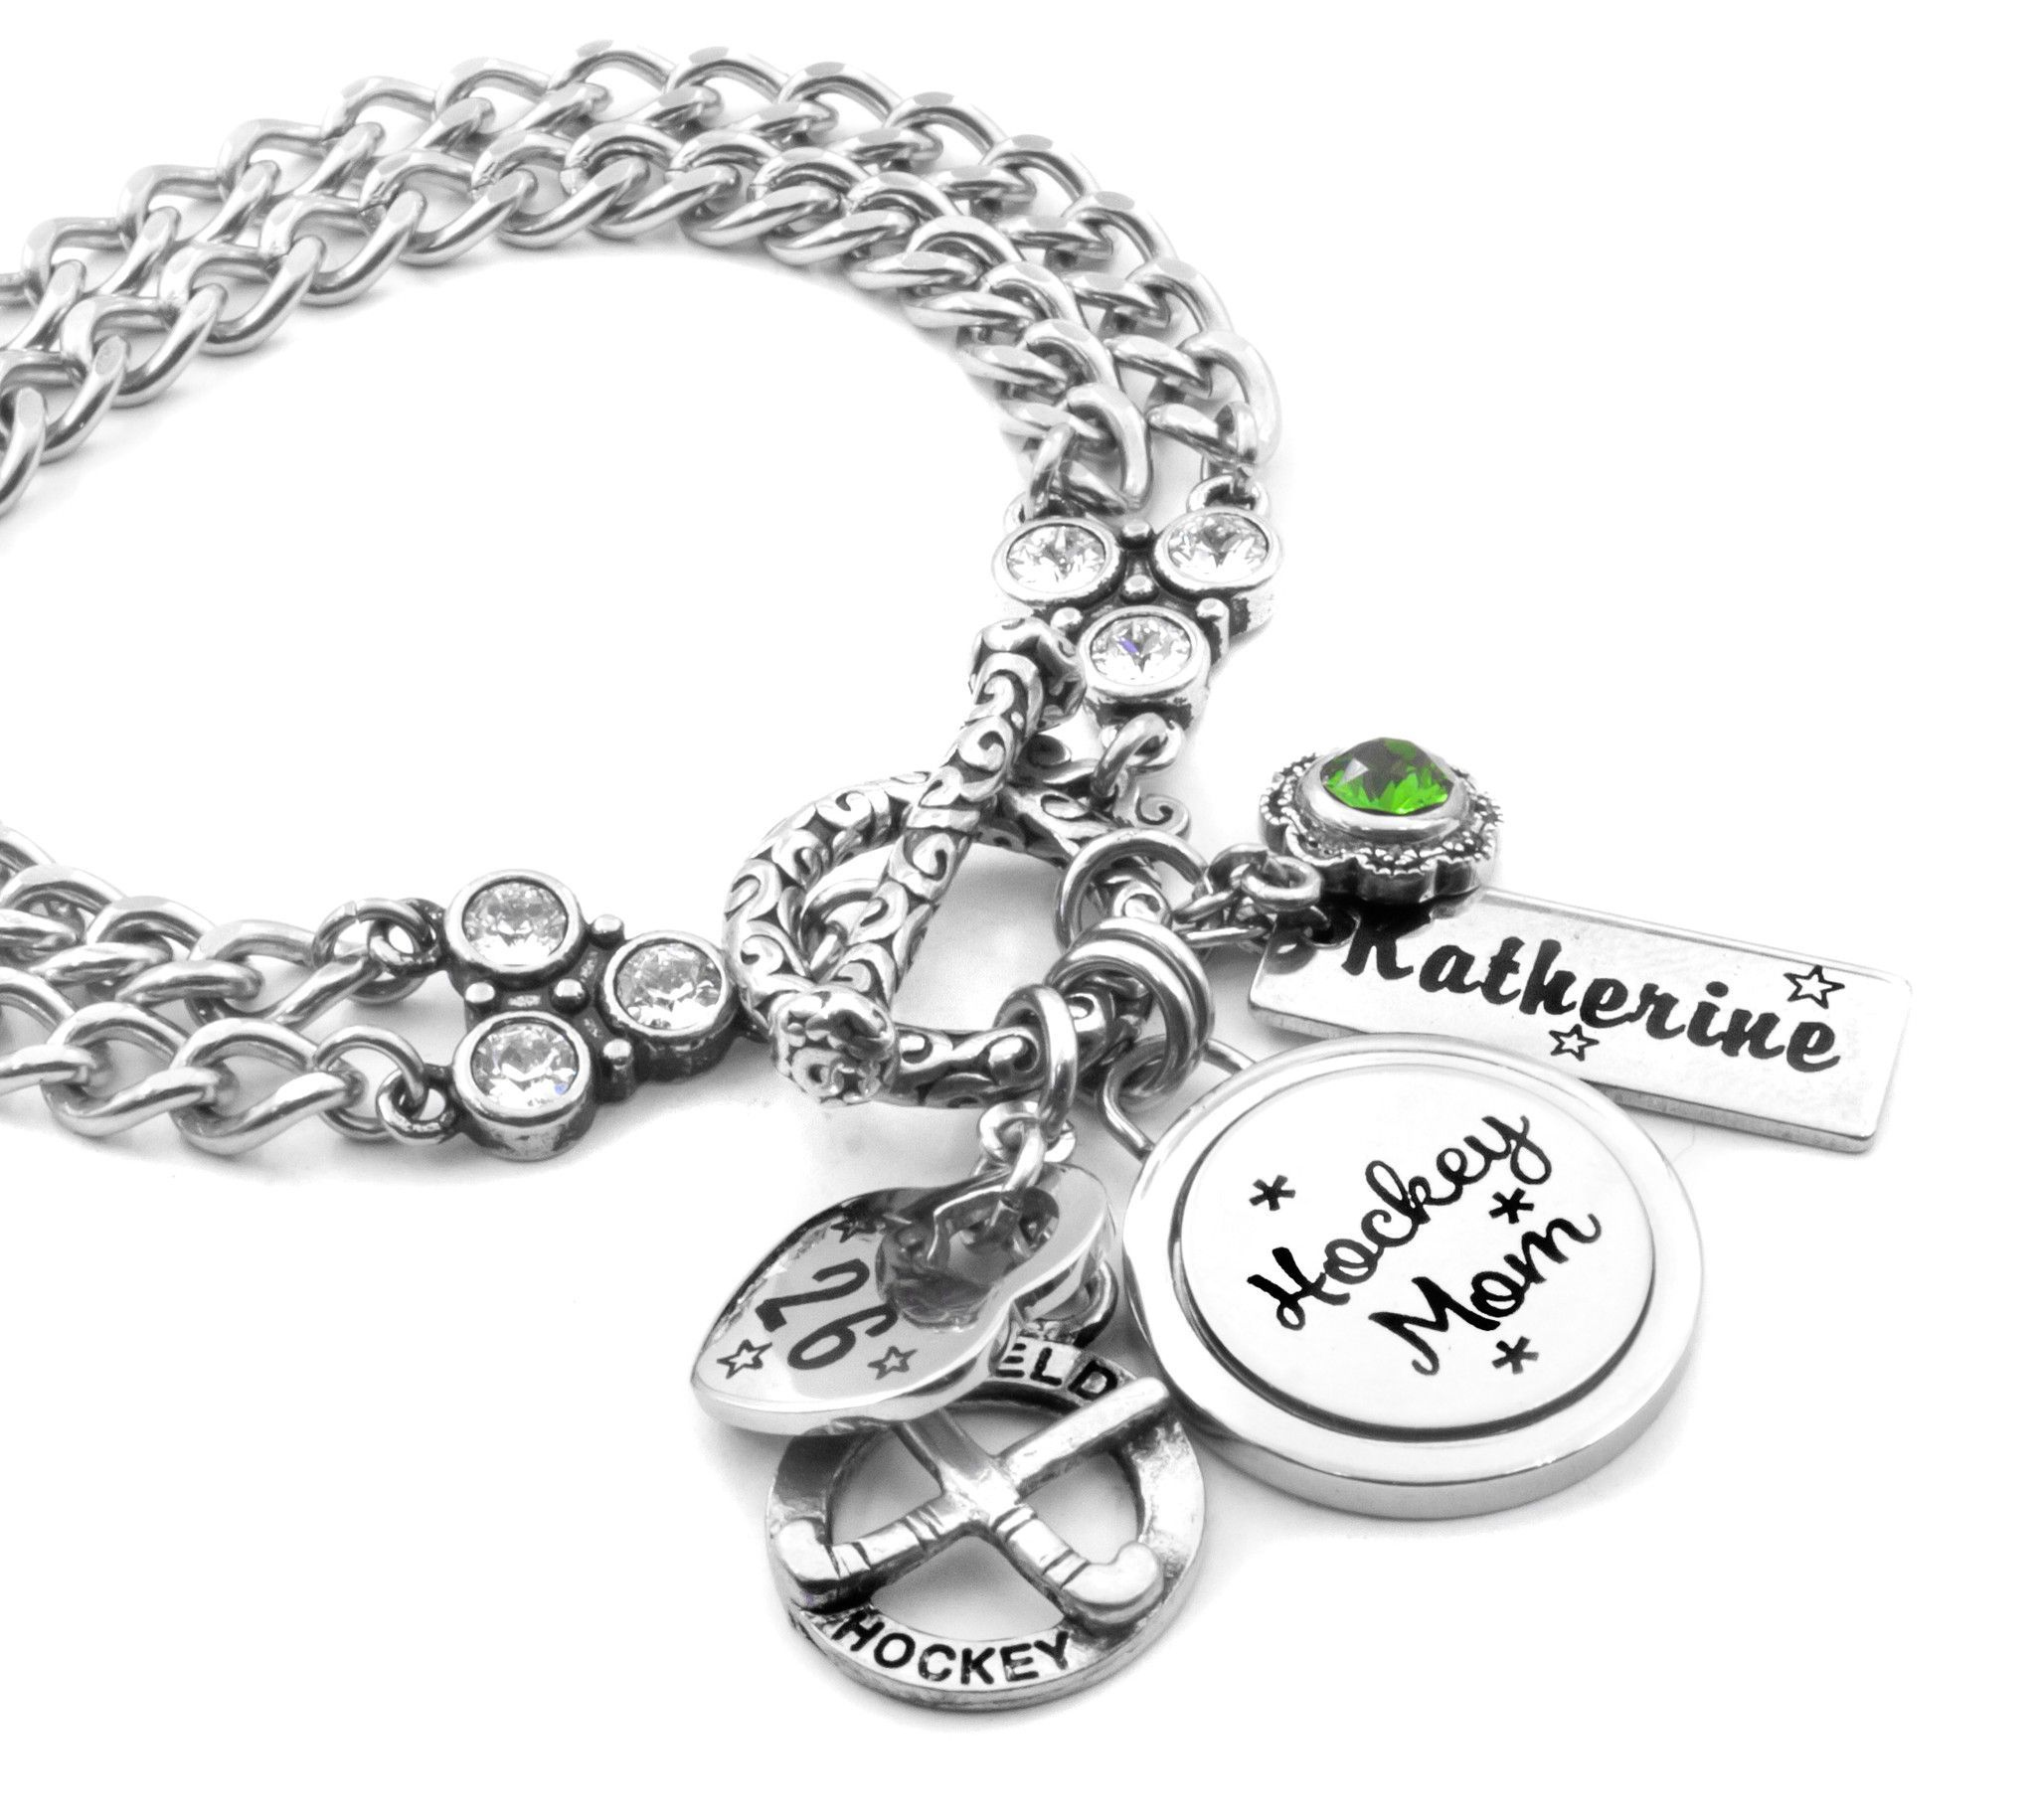 Glyph Etched Heart With Field Inside Small Tattoo: Bracelets, Football Bracelet